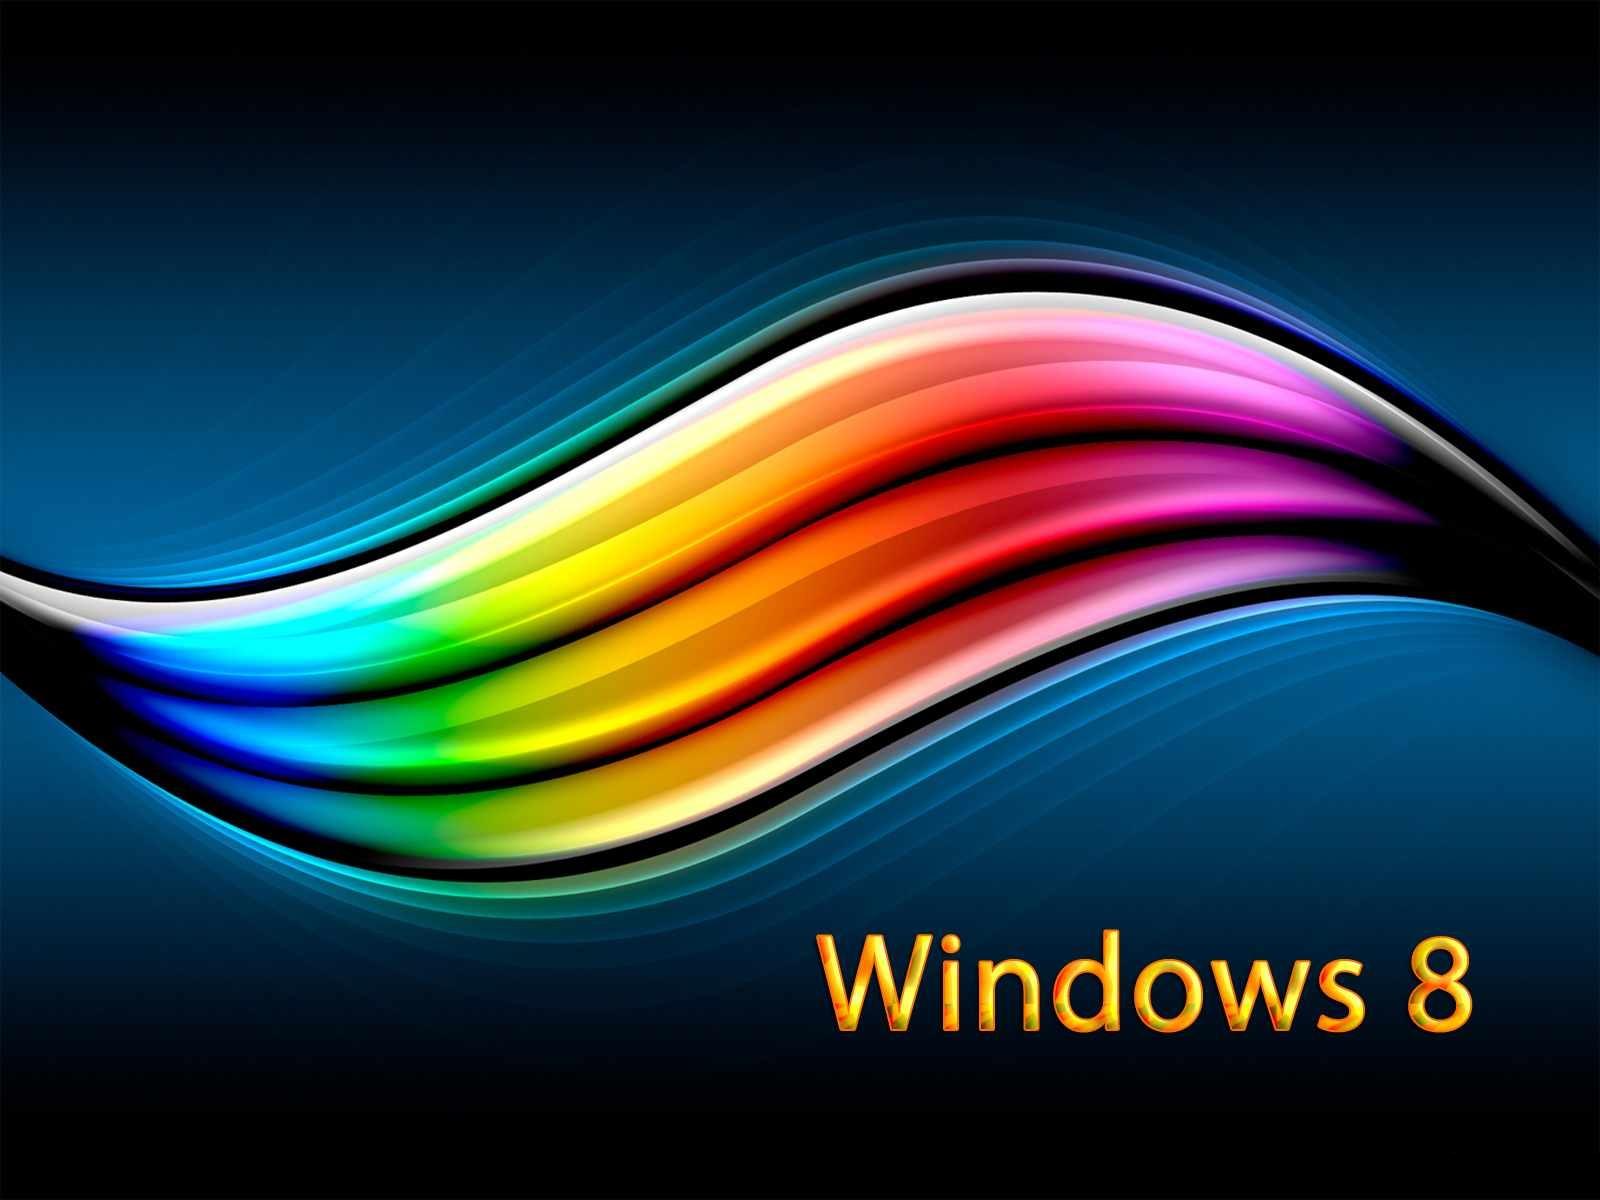 Different Wallpaper Windows 10 Desktops Wallpapersafari